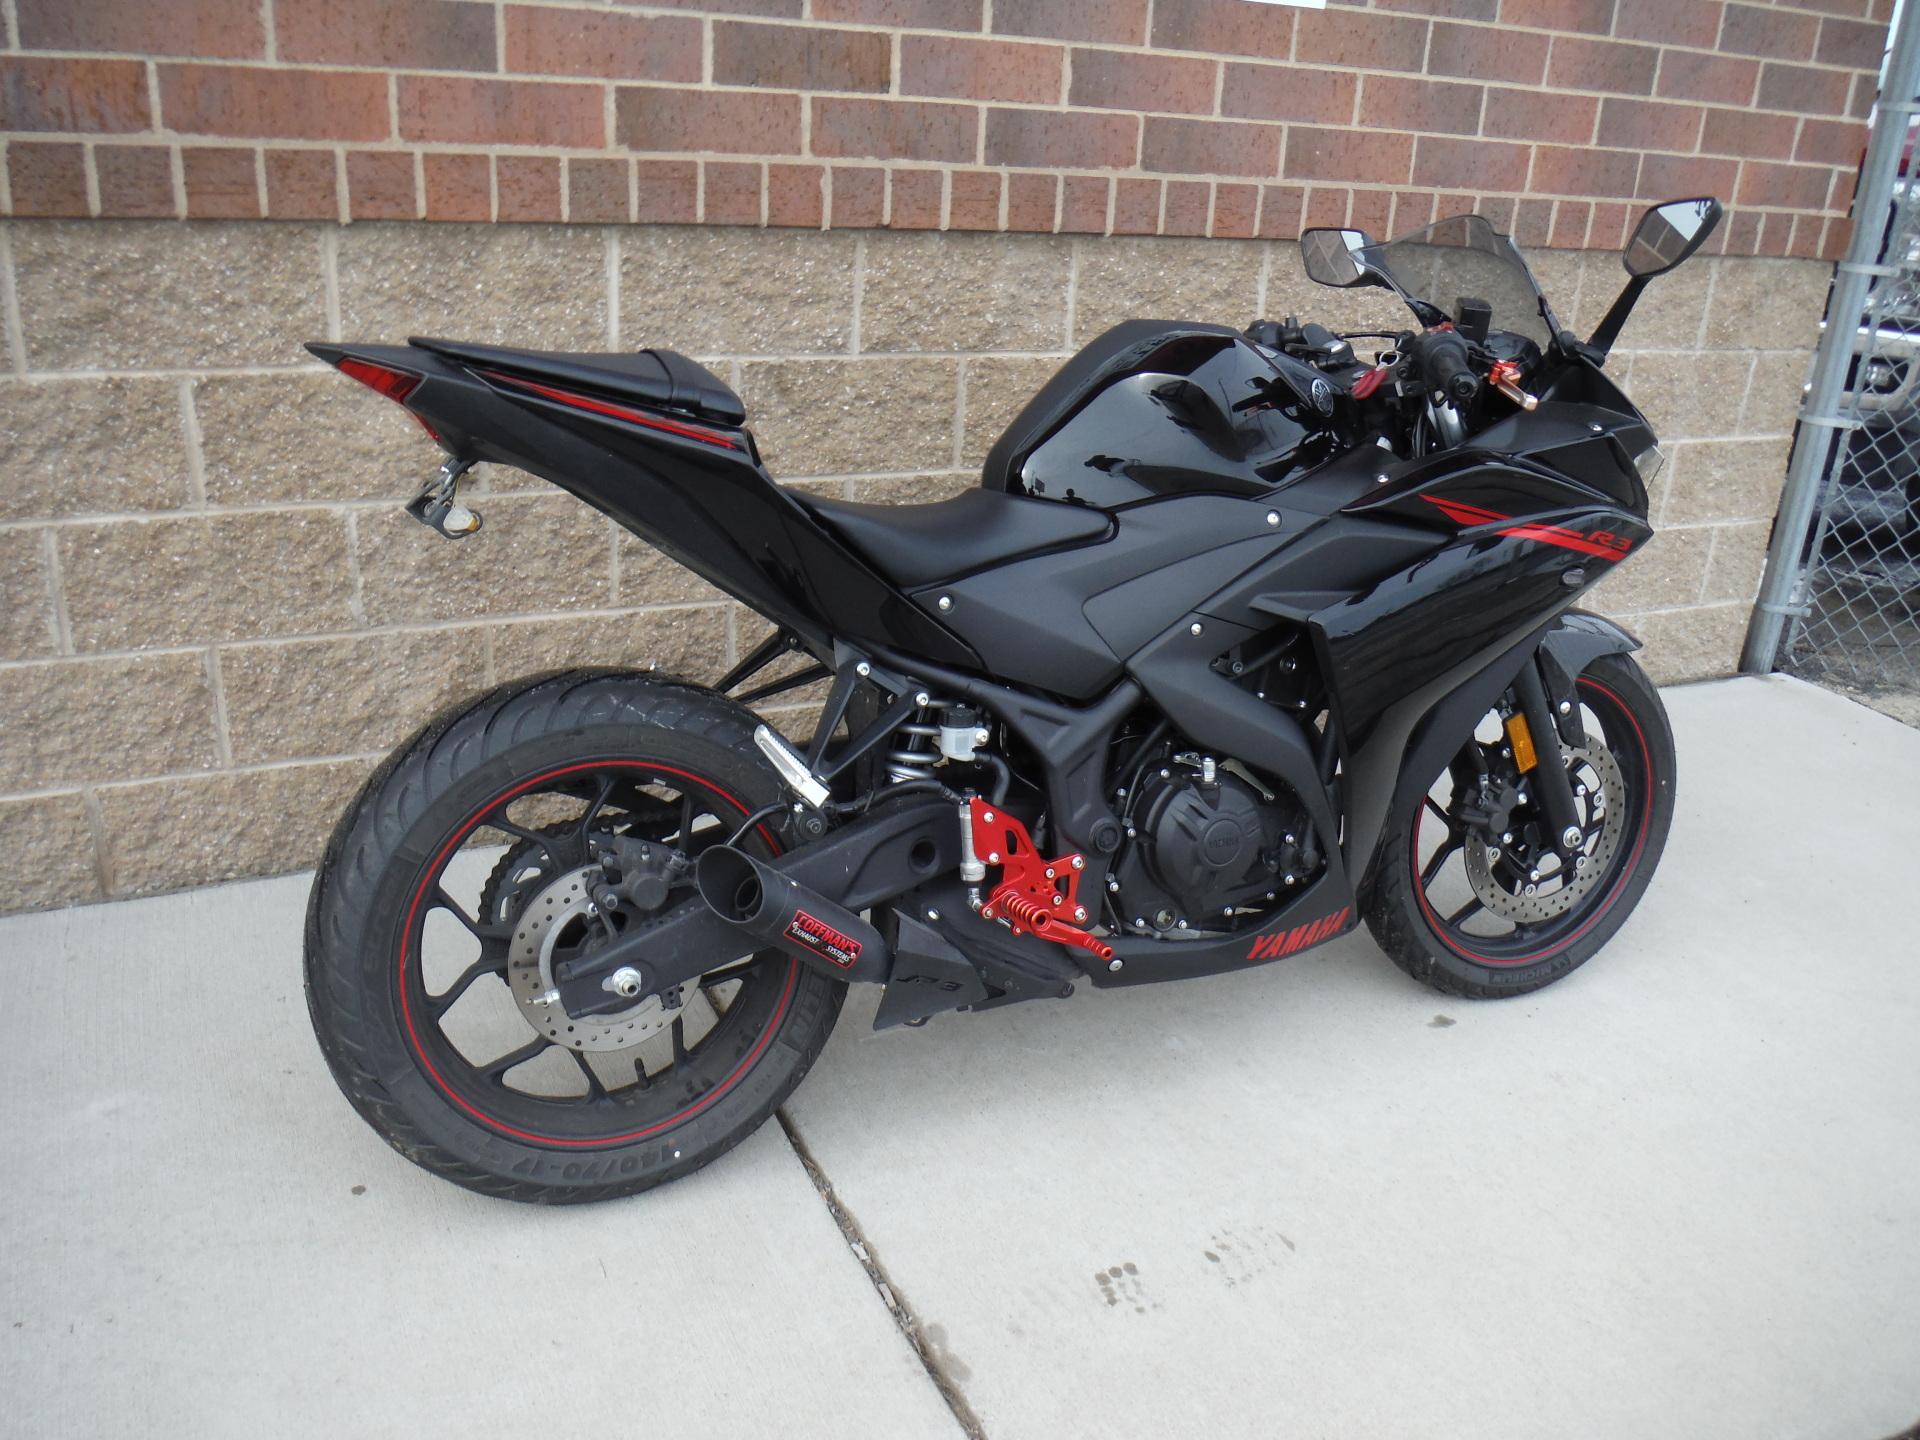 2015 Yamaha R3 Raven Edition